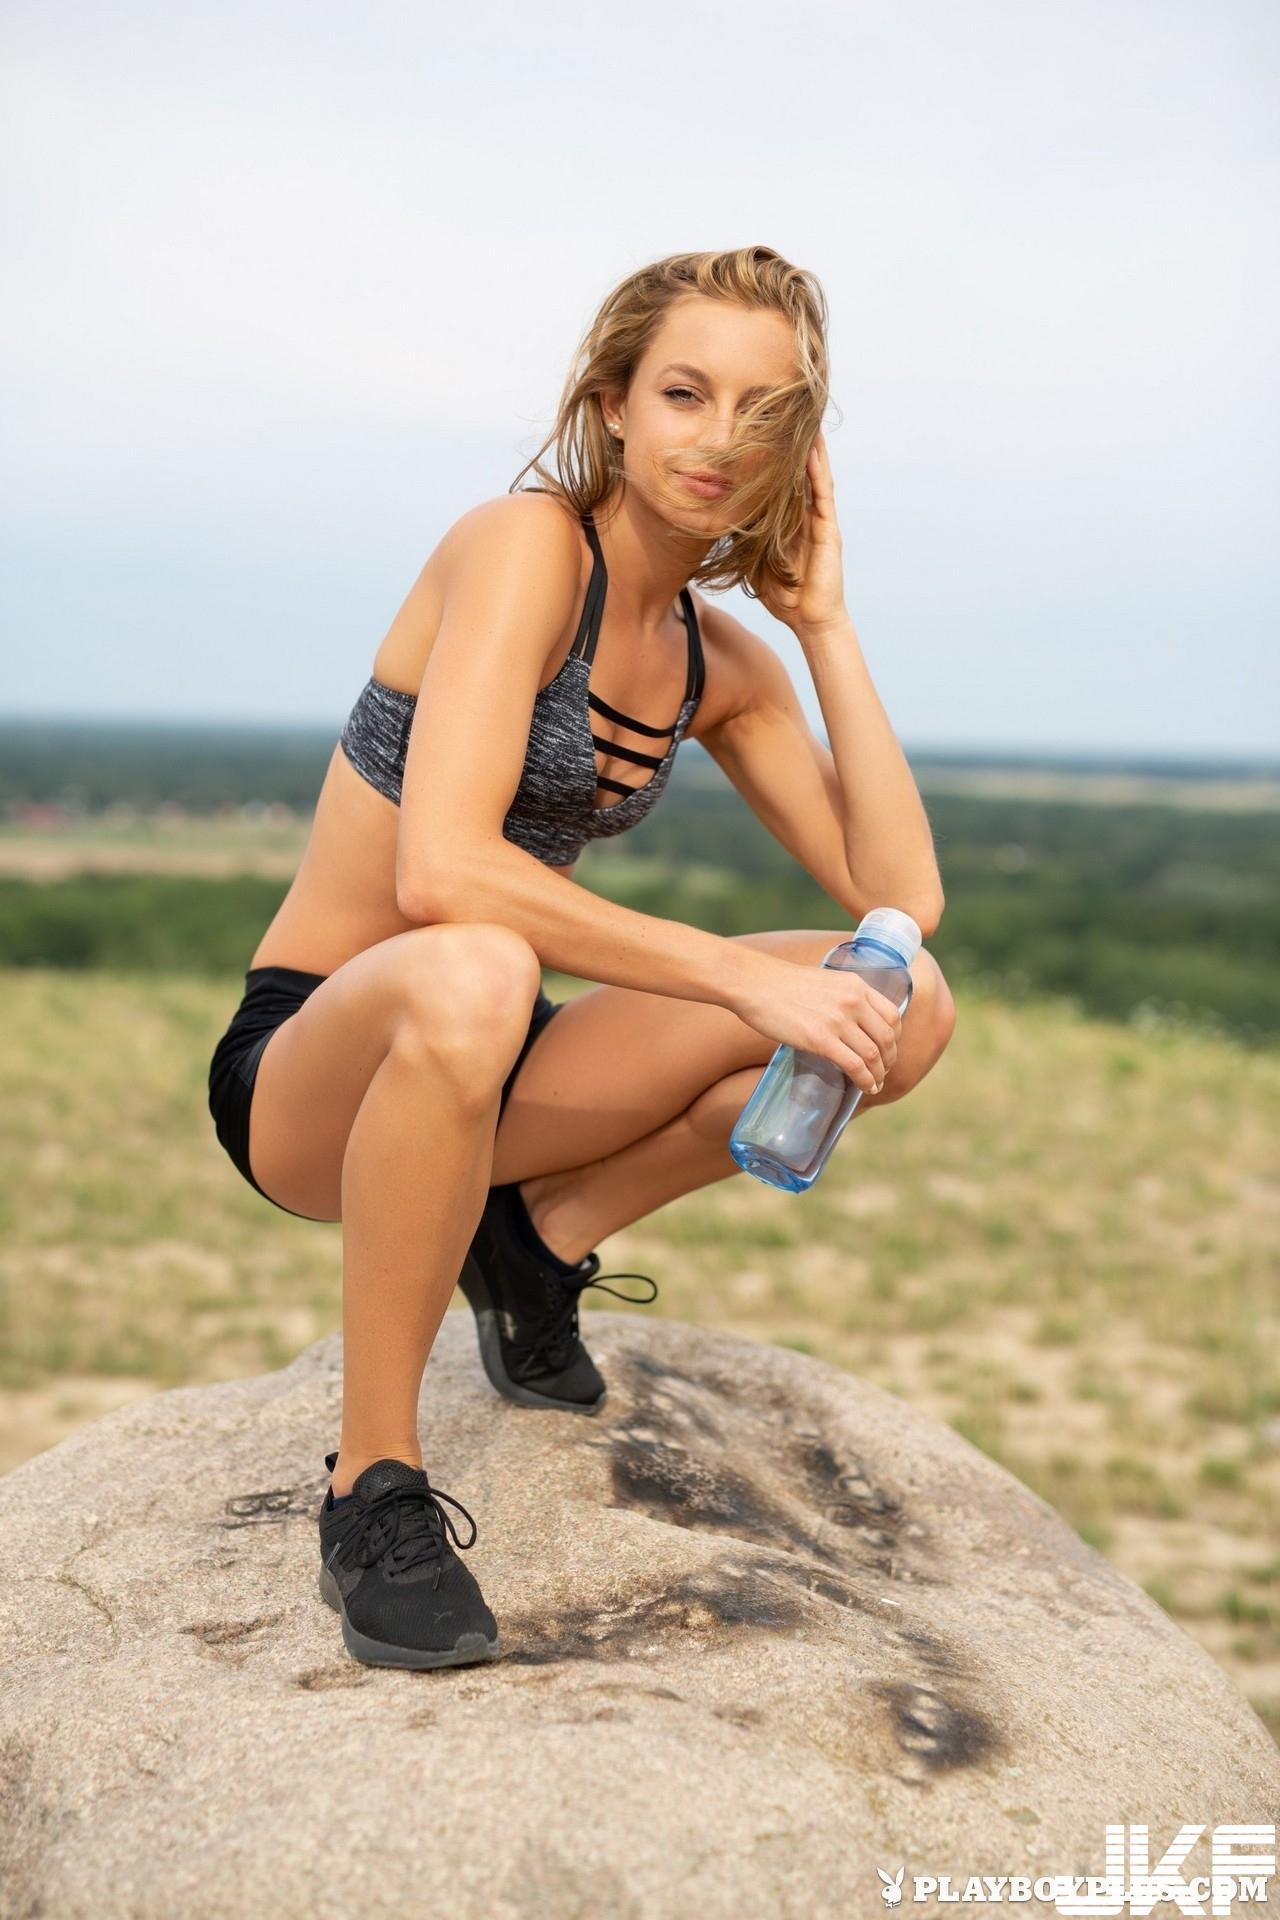 【Playboy系列】2018-10-23 Julia in Sweat it Out【40P】 - 貼圖 - 歐美寫真 -